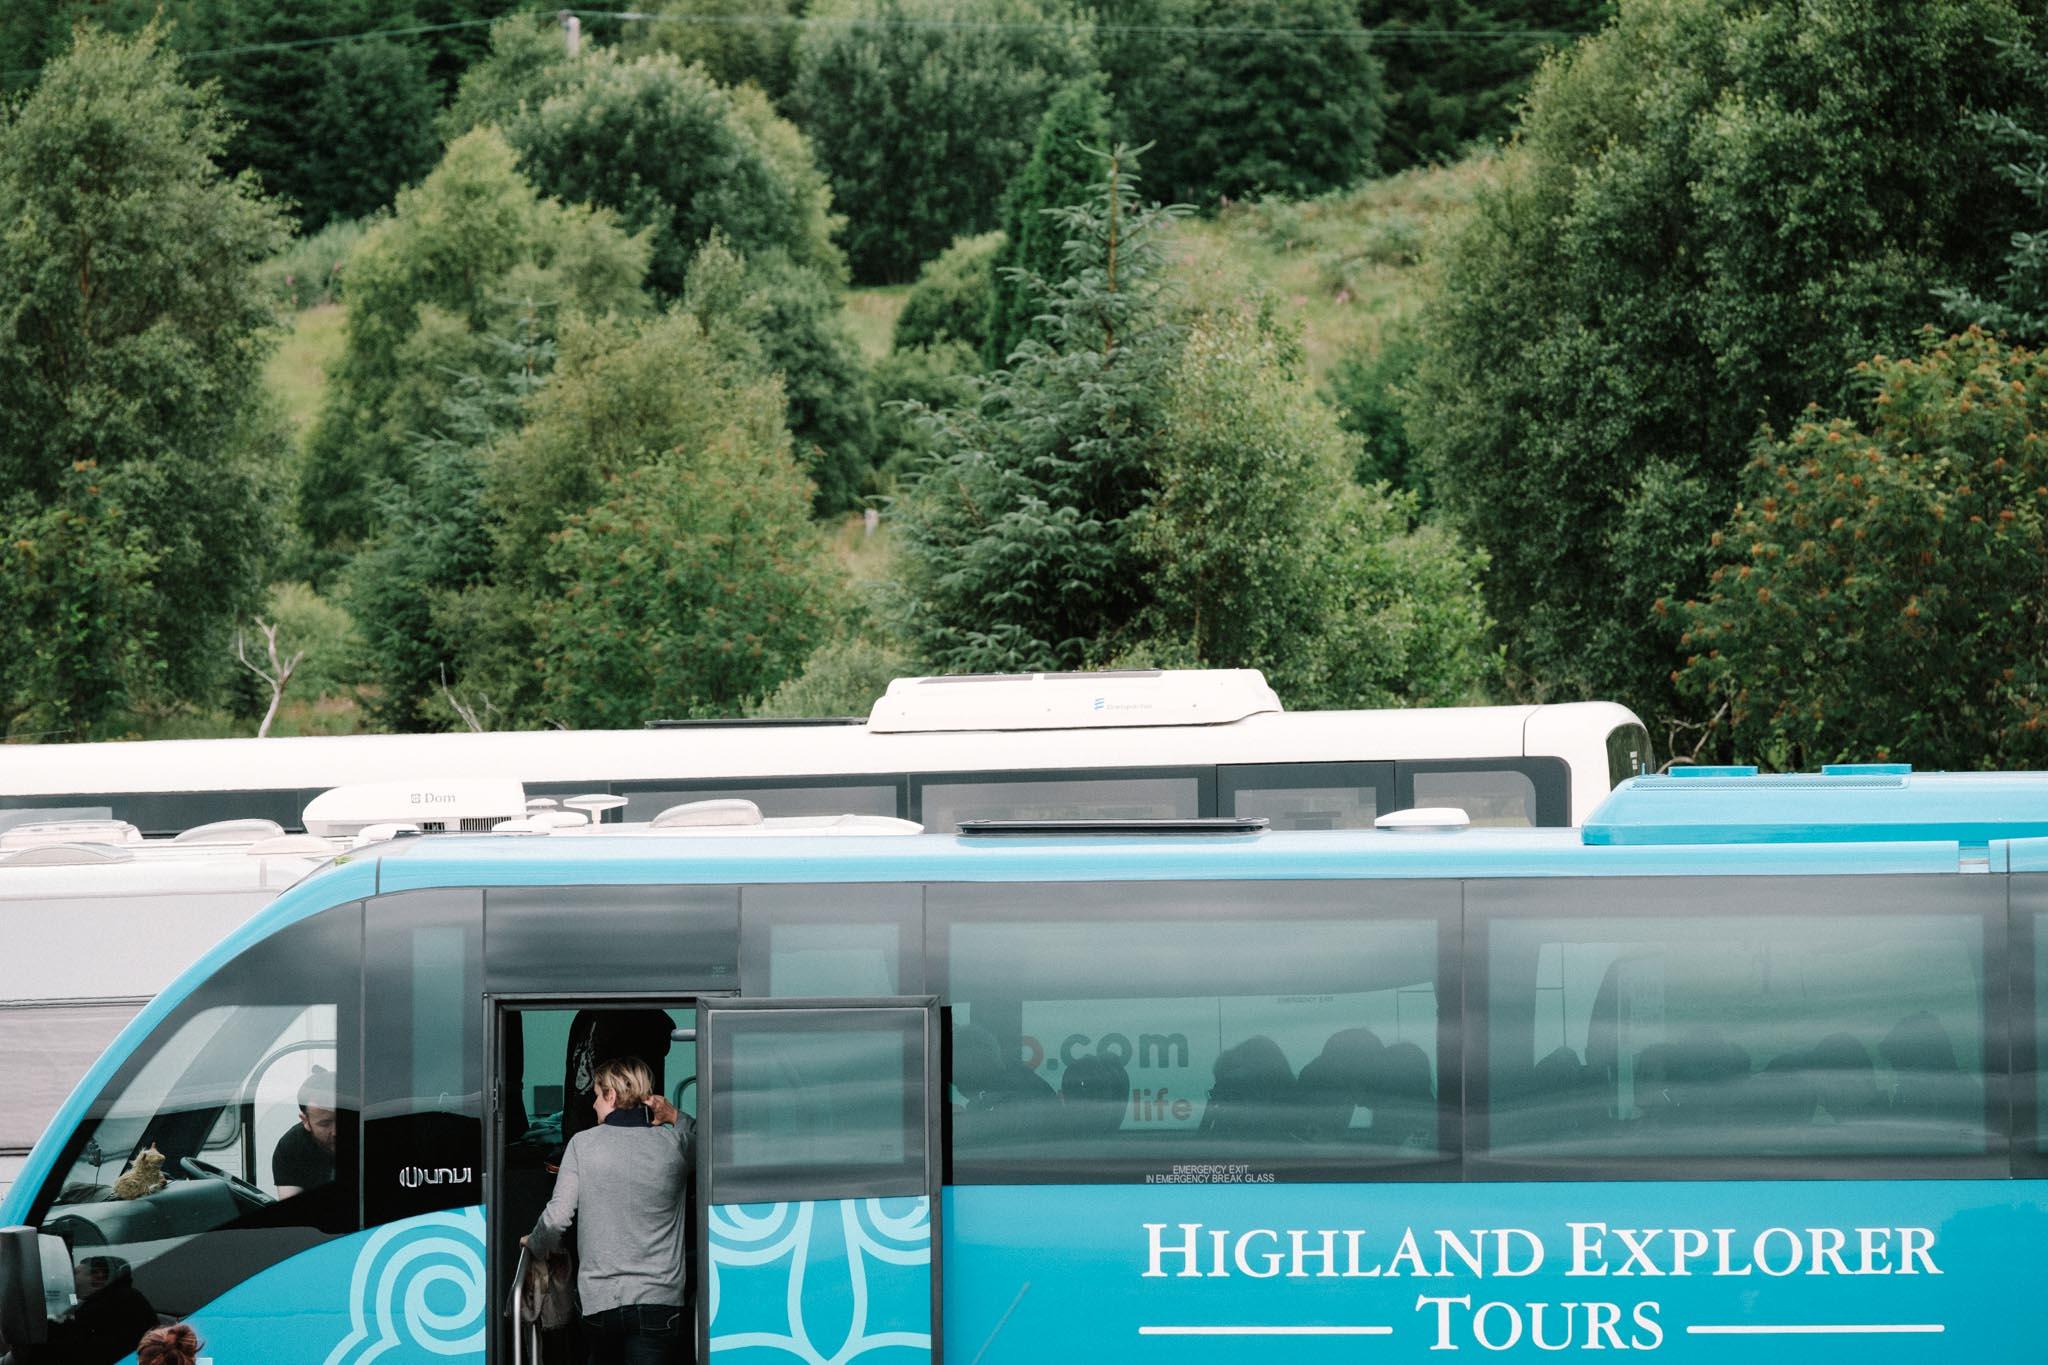 Highland Explorer Tours-160723-133555.jpg